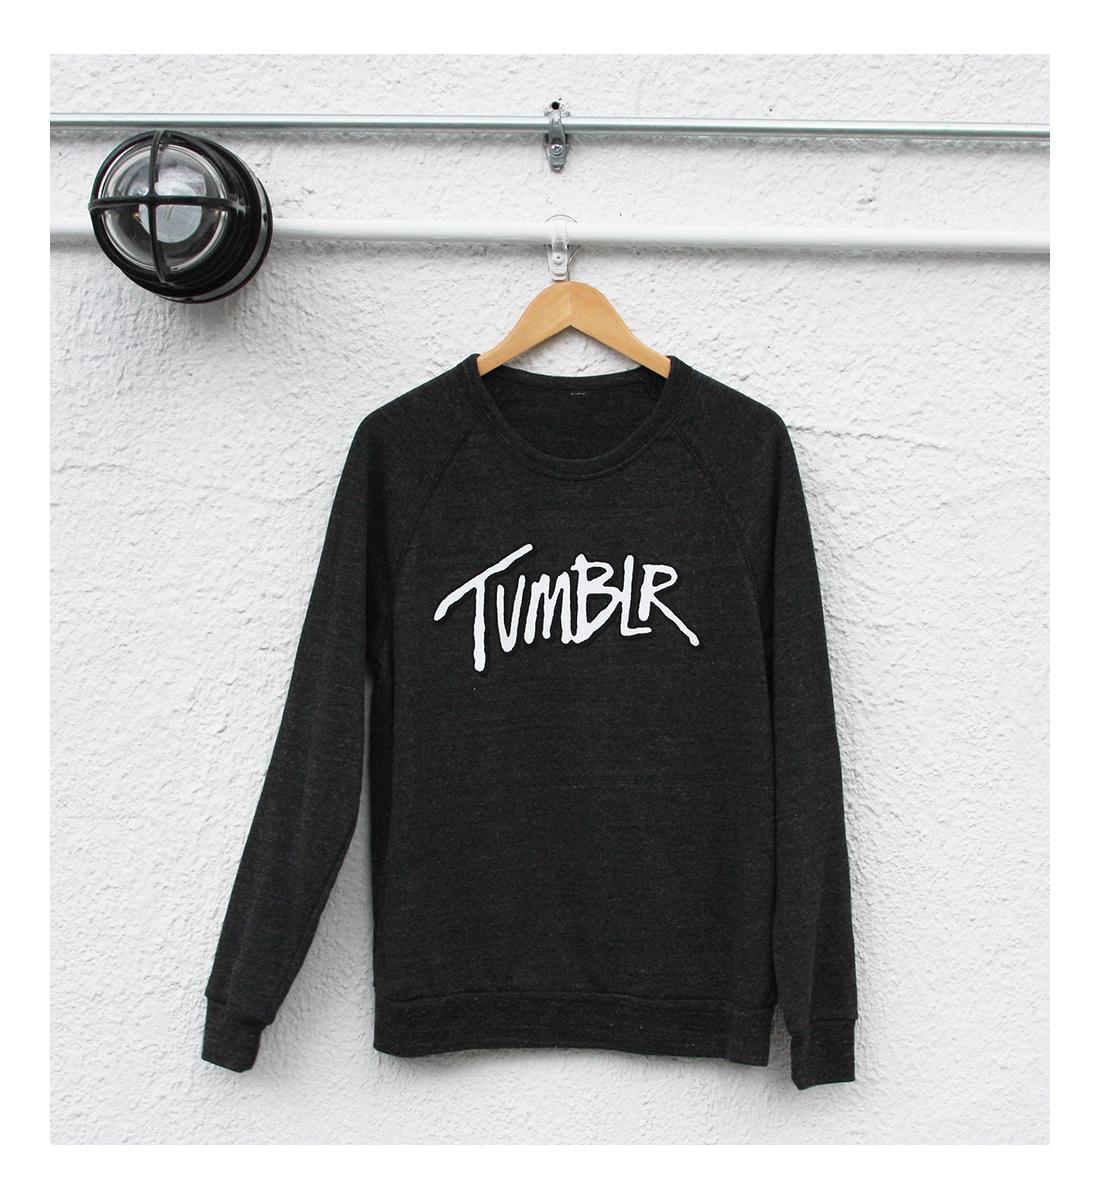 Tumblr - Tumblr 90s Crew Sweatshirt